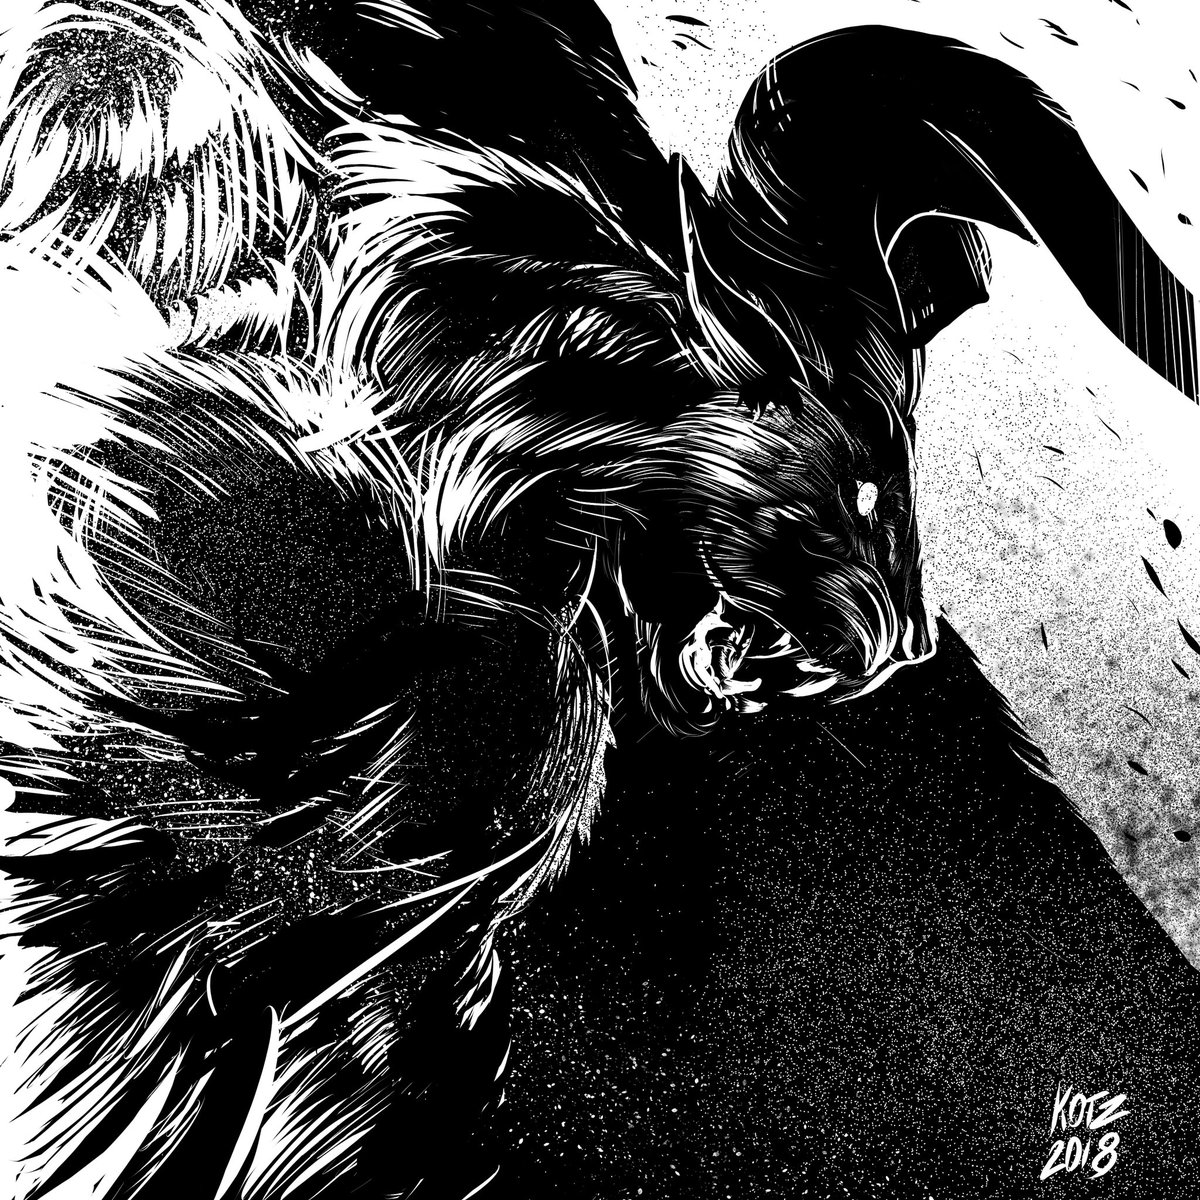 Nosferatu Zodd Berserk Berserk T Berserk Manga And